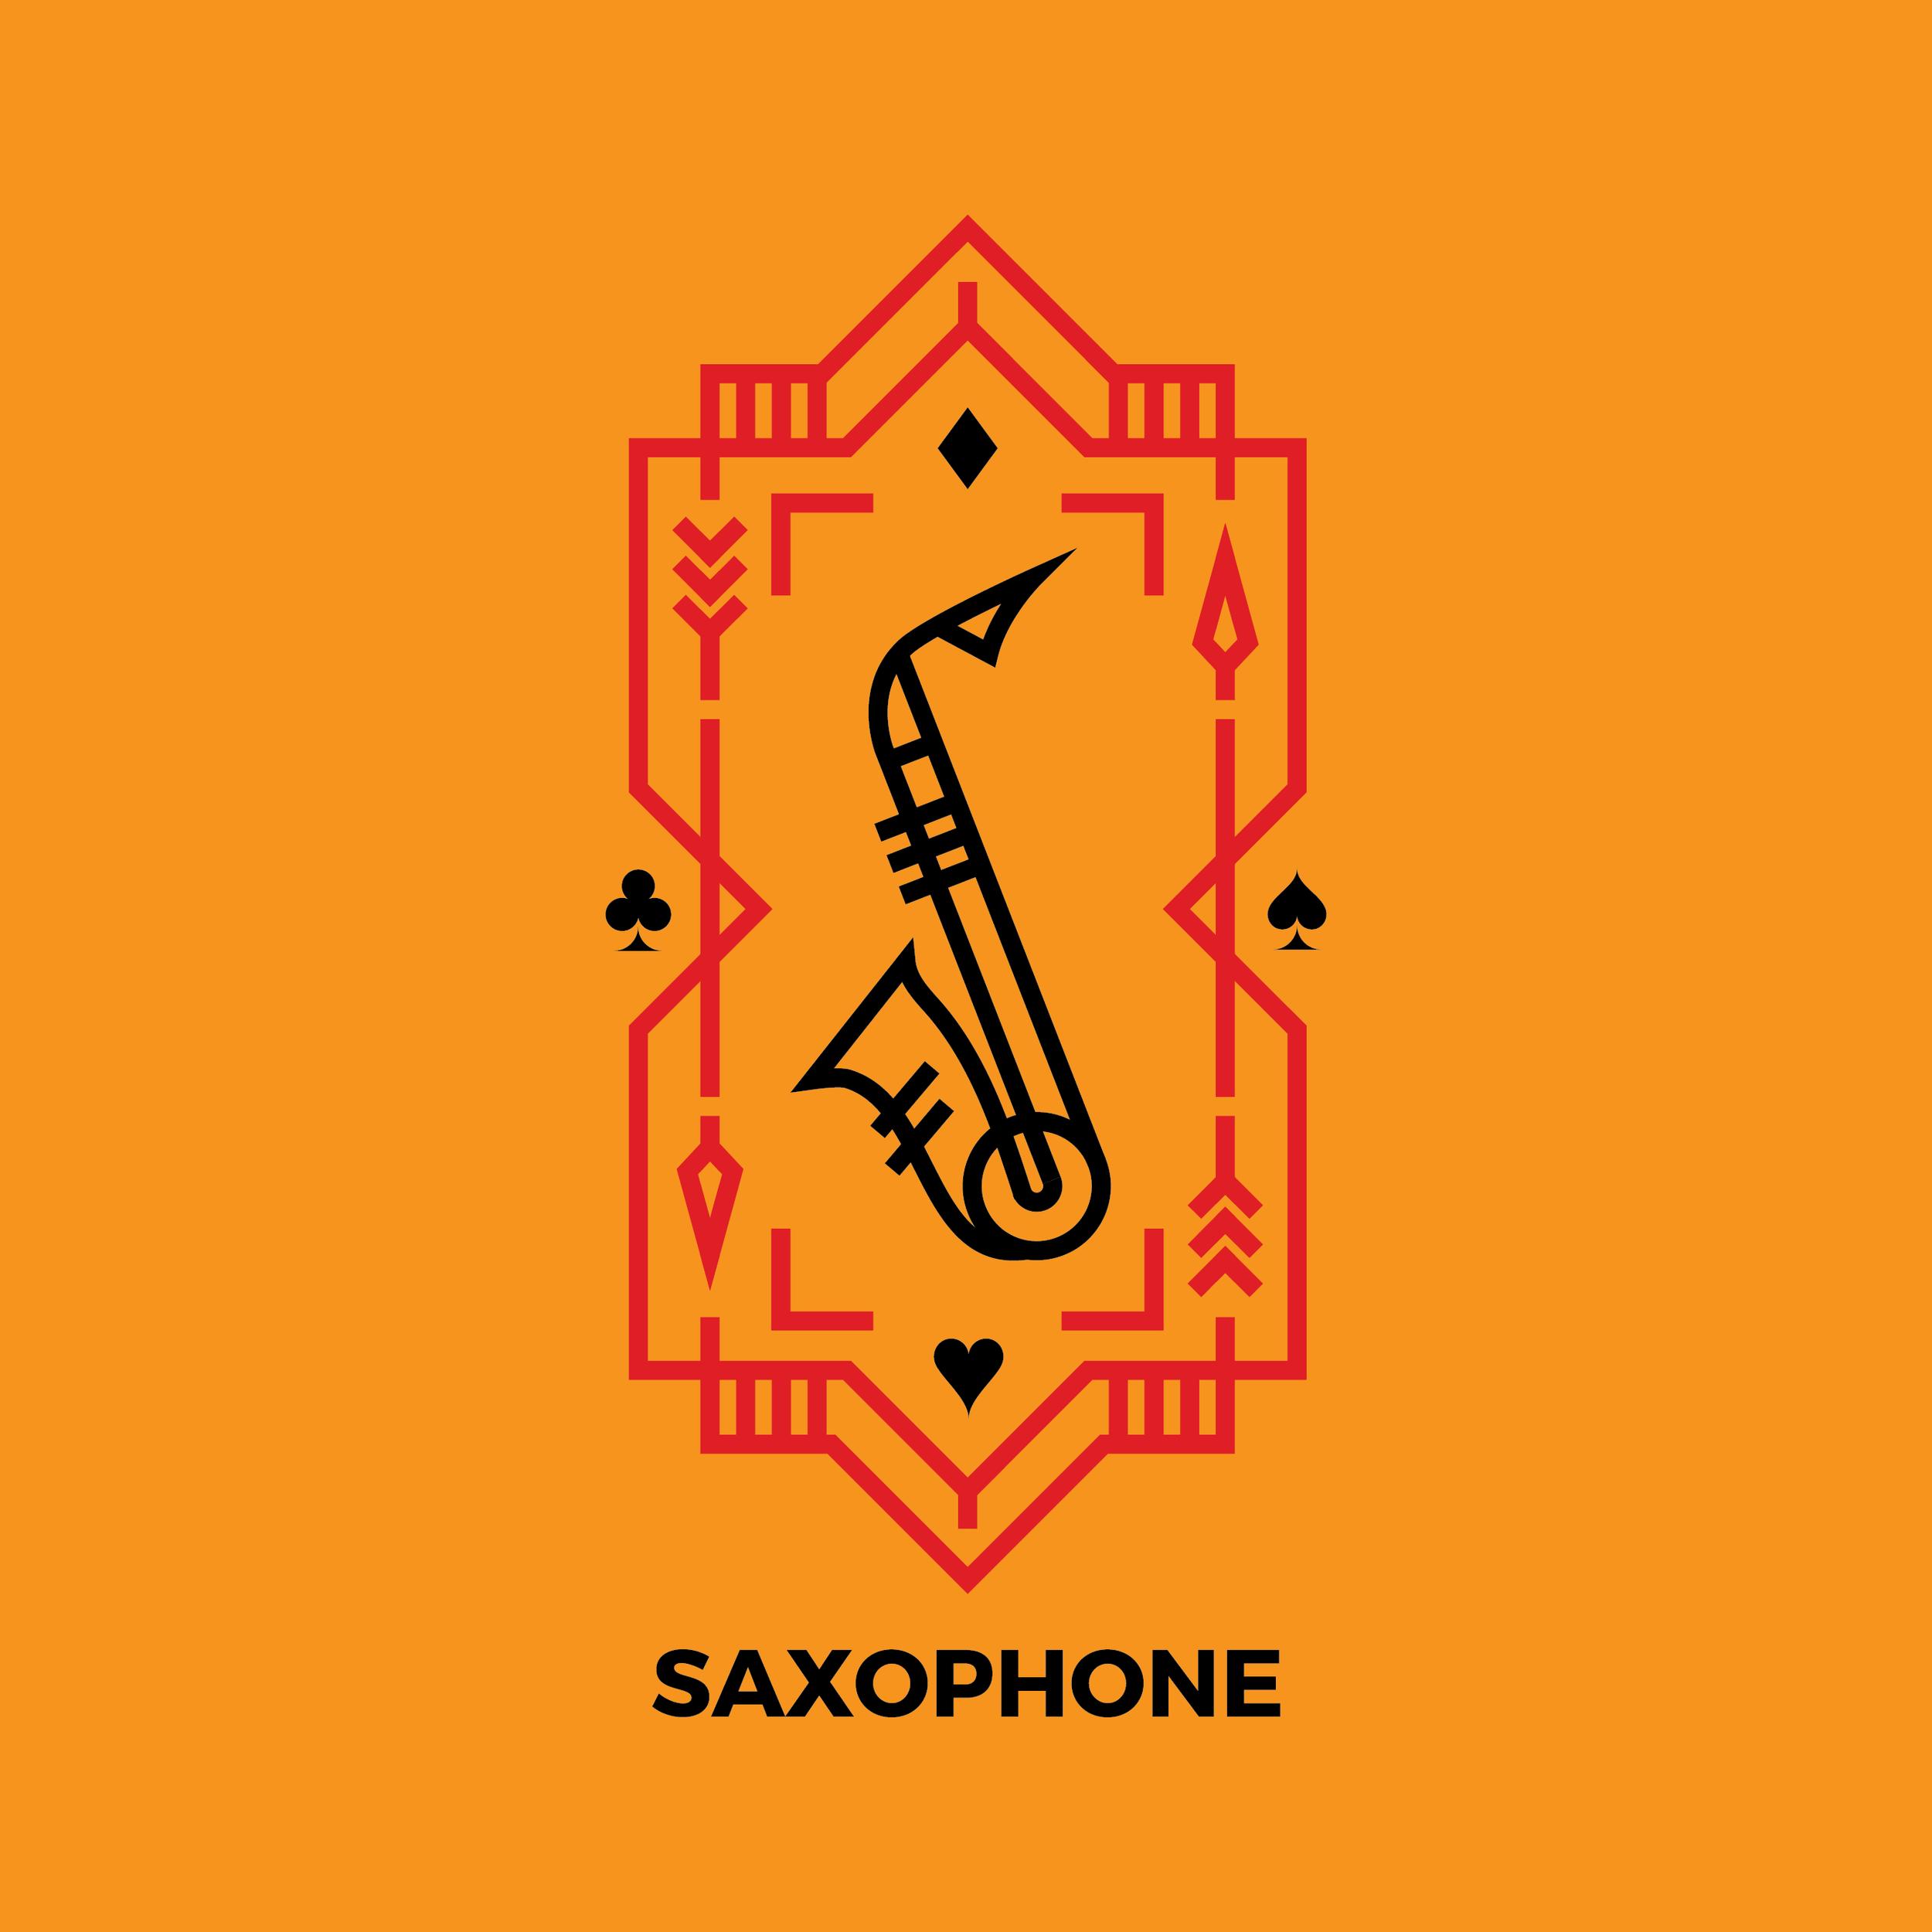 Saxophone-01.png